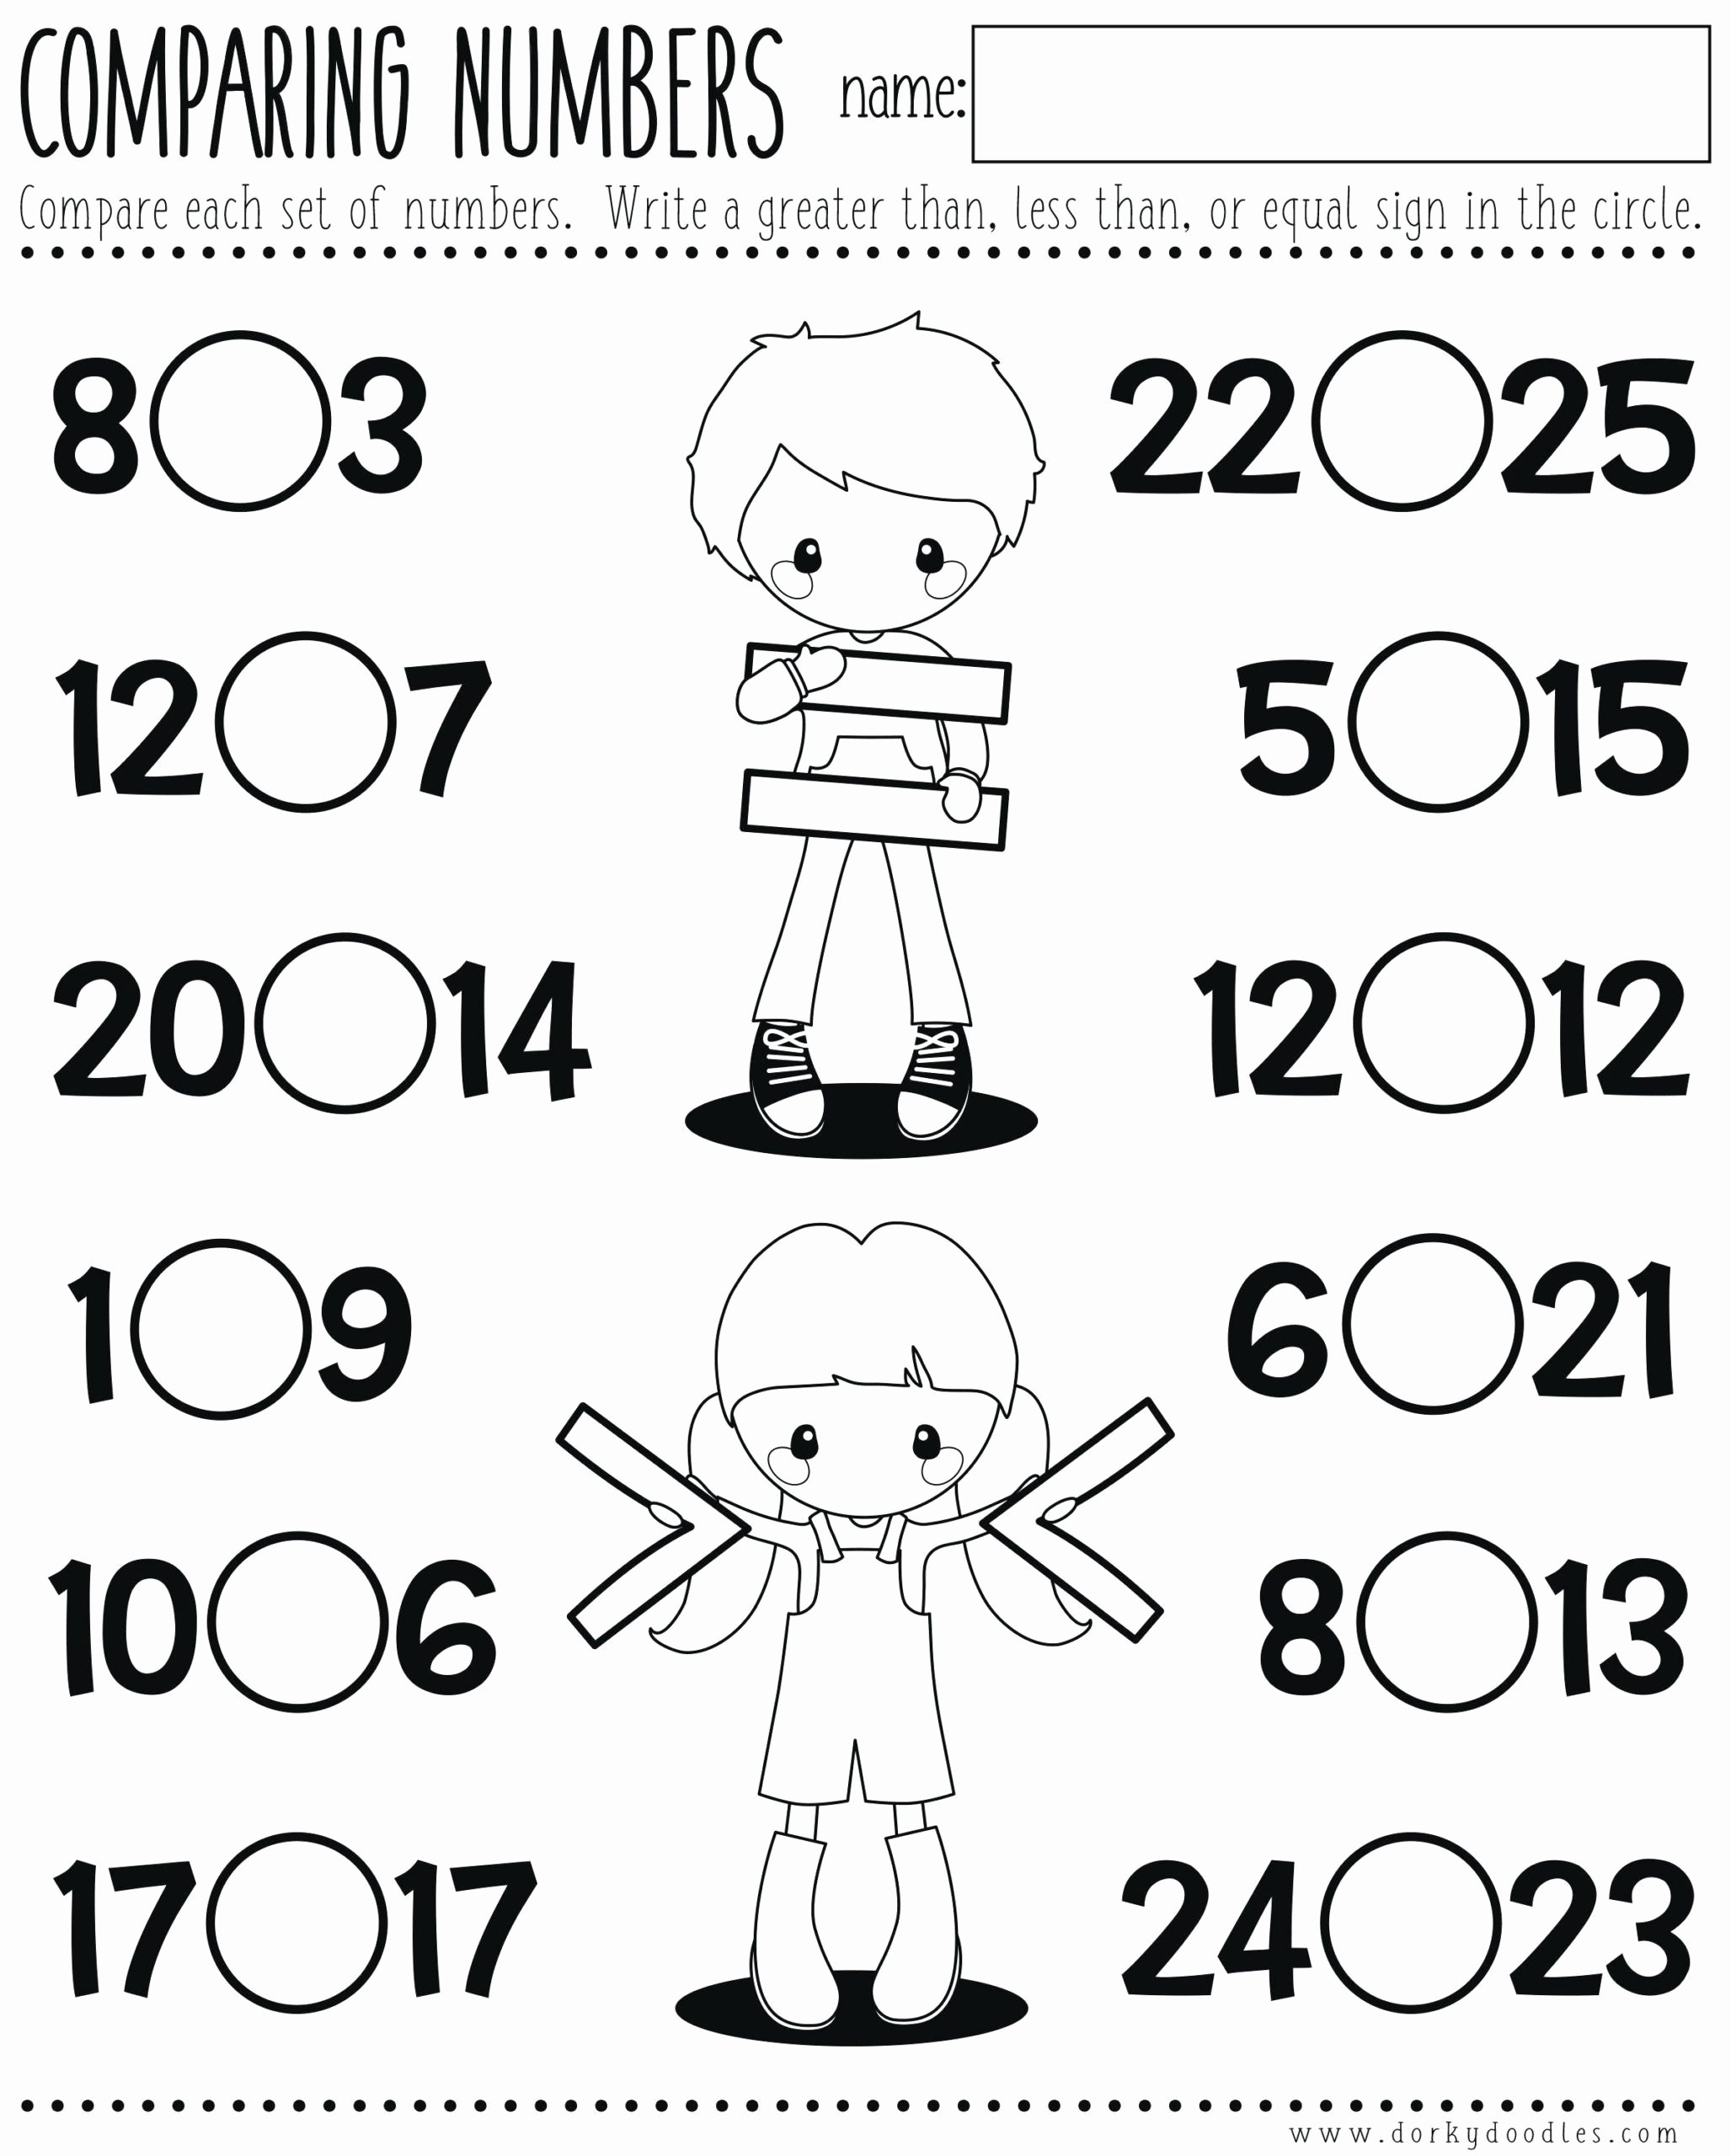 Concept Worksheets for Preschoolers Awesome Less Than Kindergarten Worksheets Printable and Same